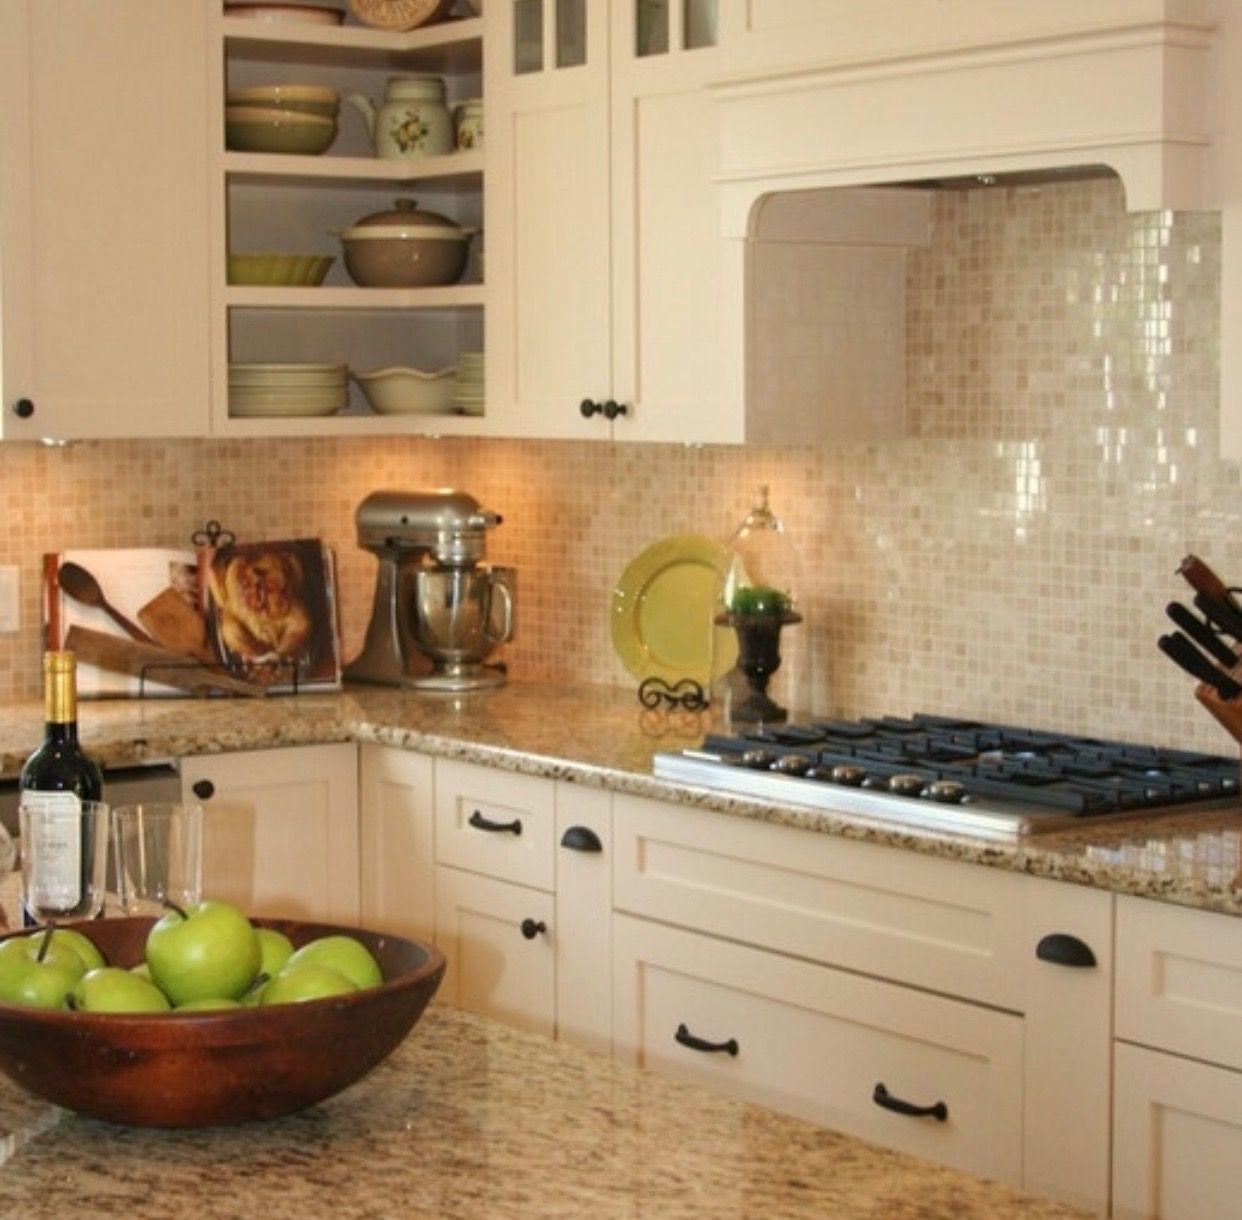 Pin By Tilebuys On Kitchen Design In 2020 Granite Countertops Kitchen Kitchen Backsplash Designs Cream Colored Kitchen Cabinets